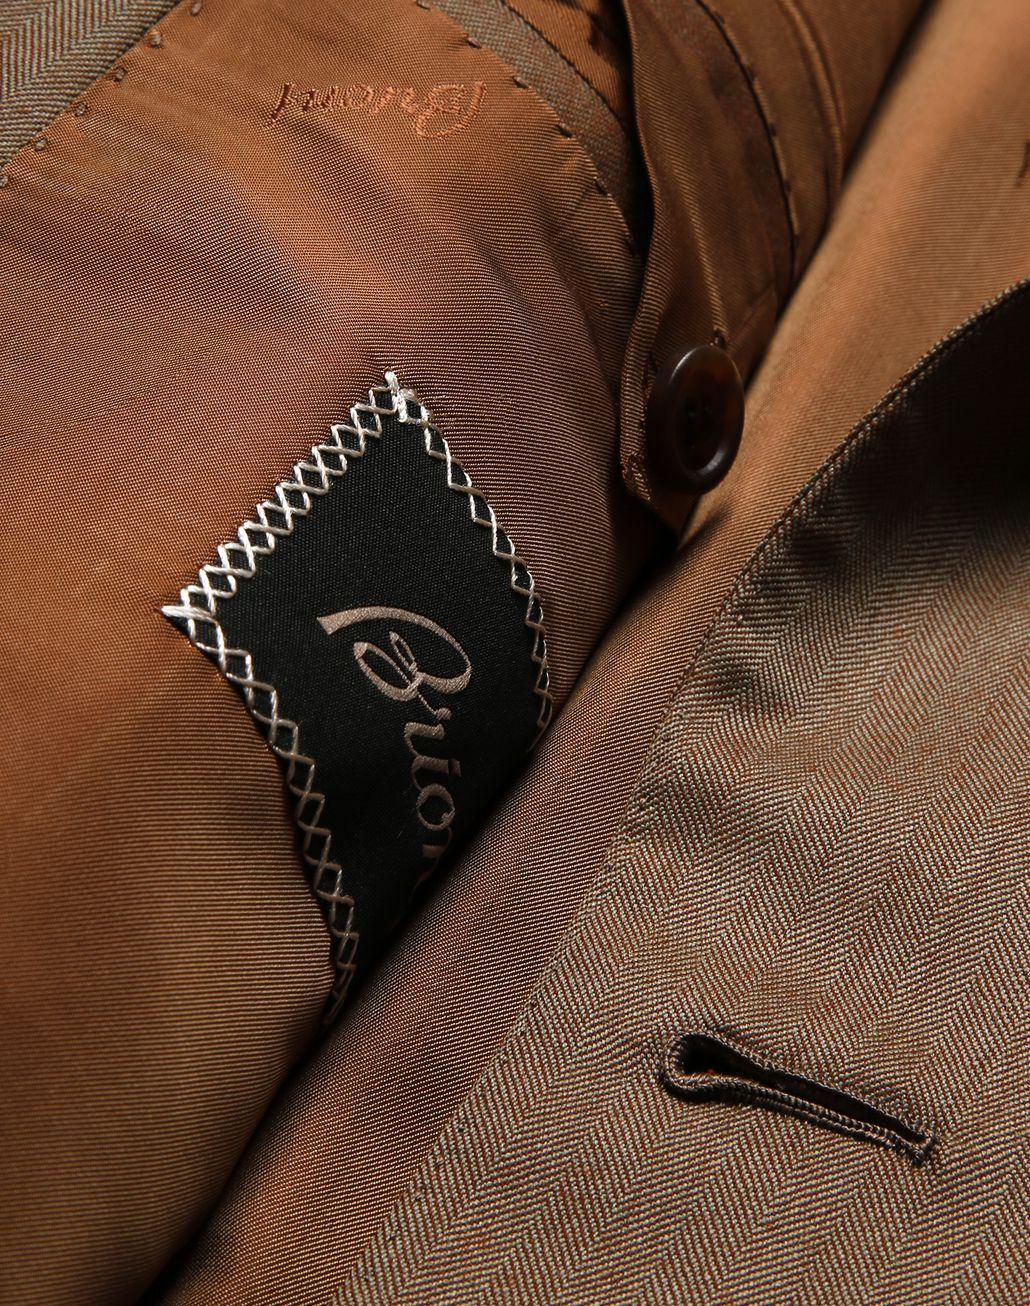 BRIONI Camel Herringbone Parioli Suit Suits & Jackets Man b